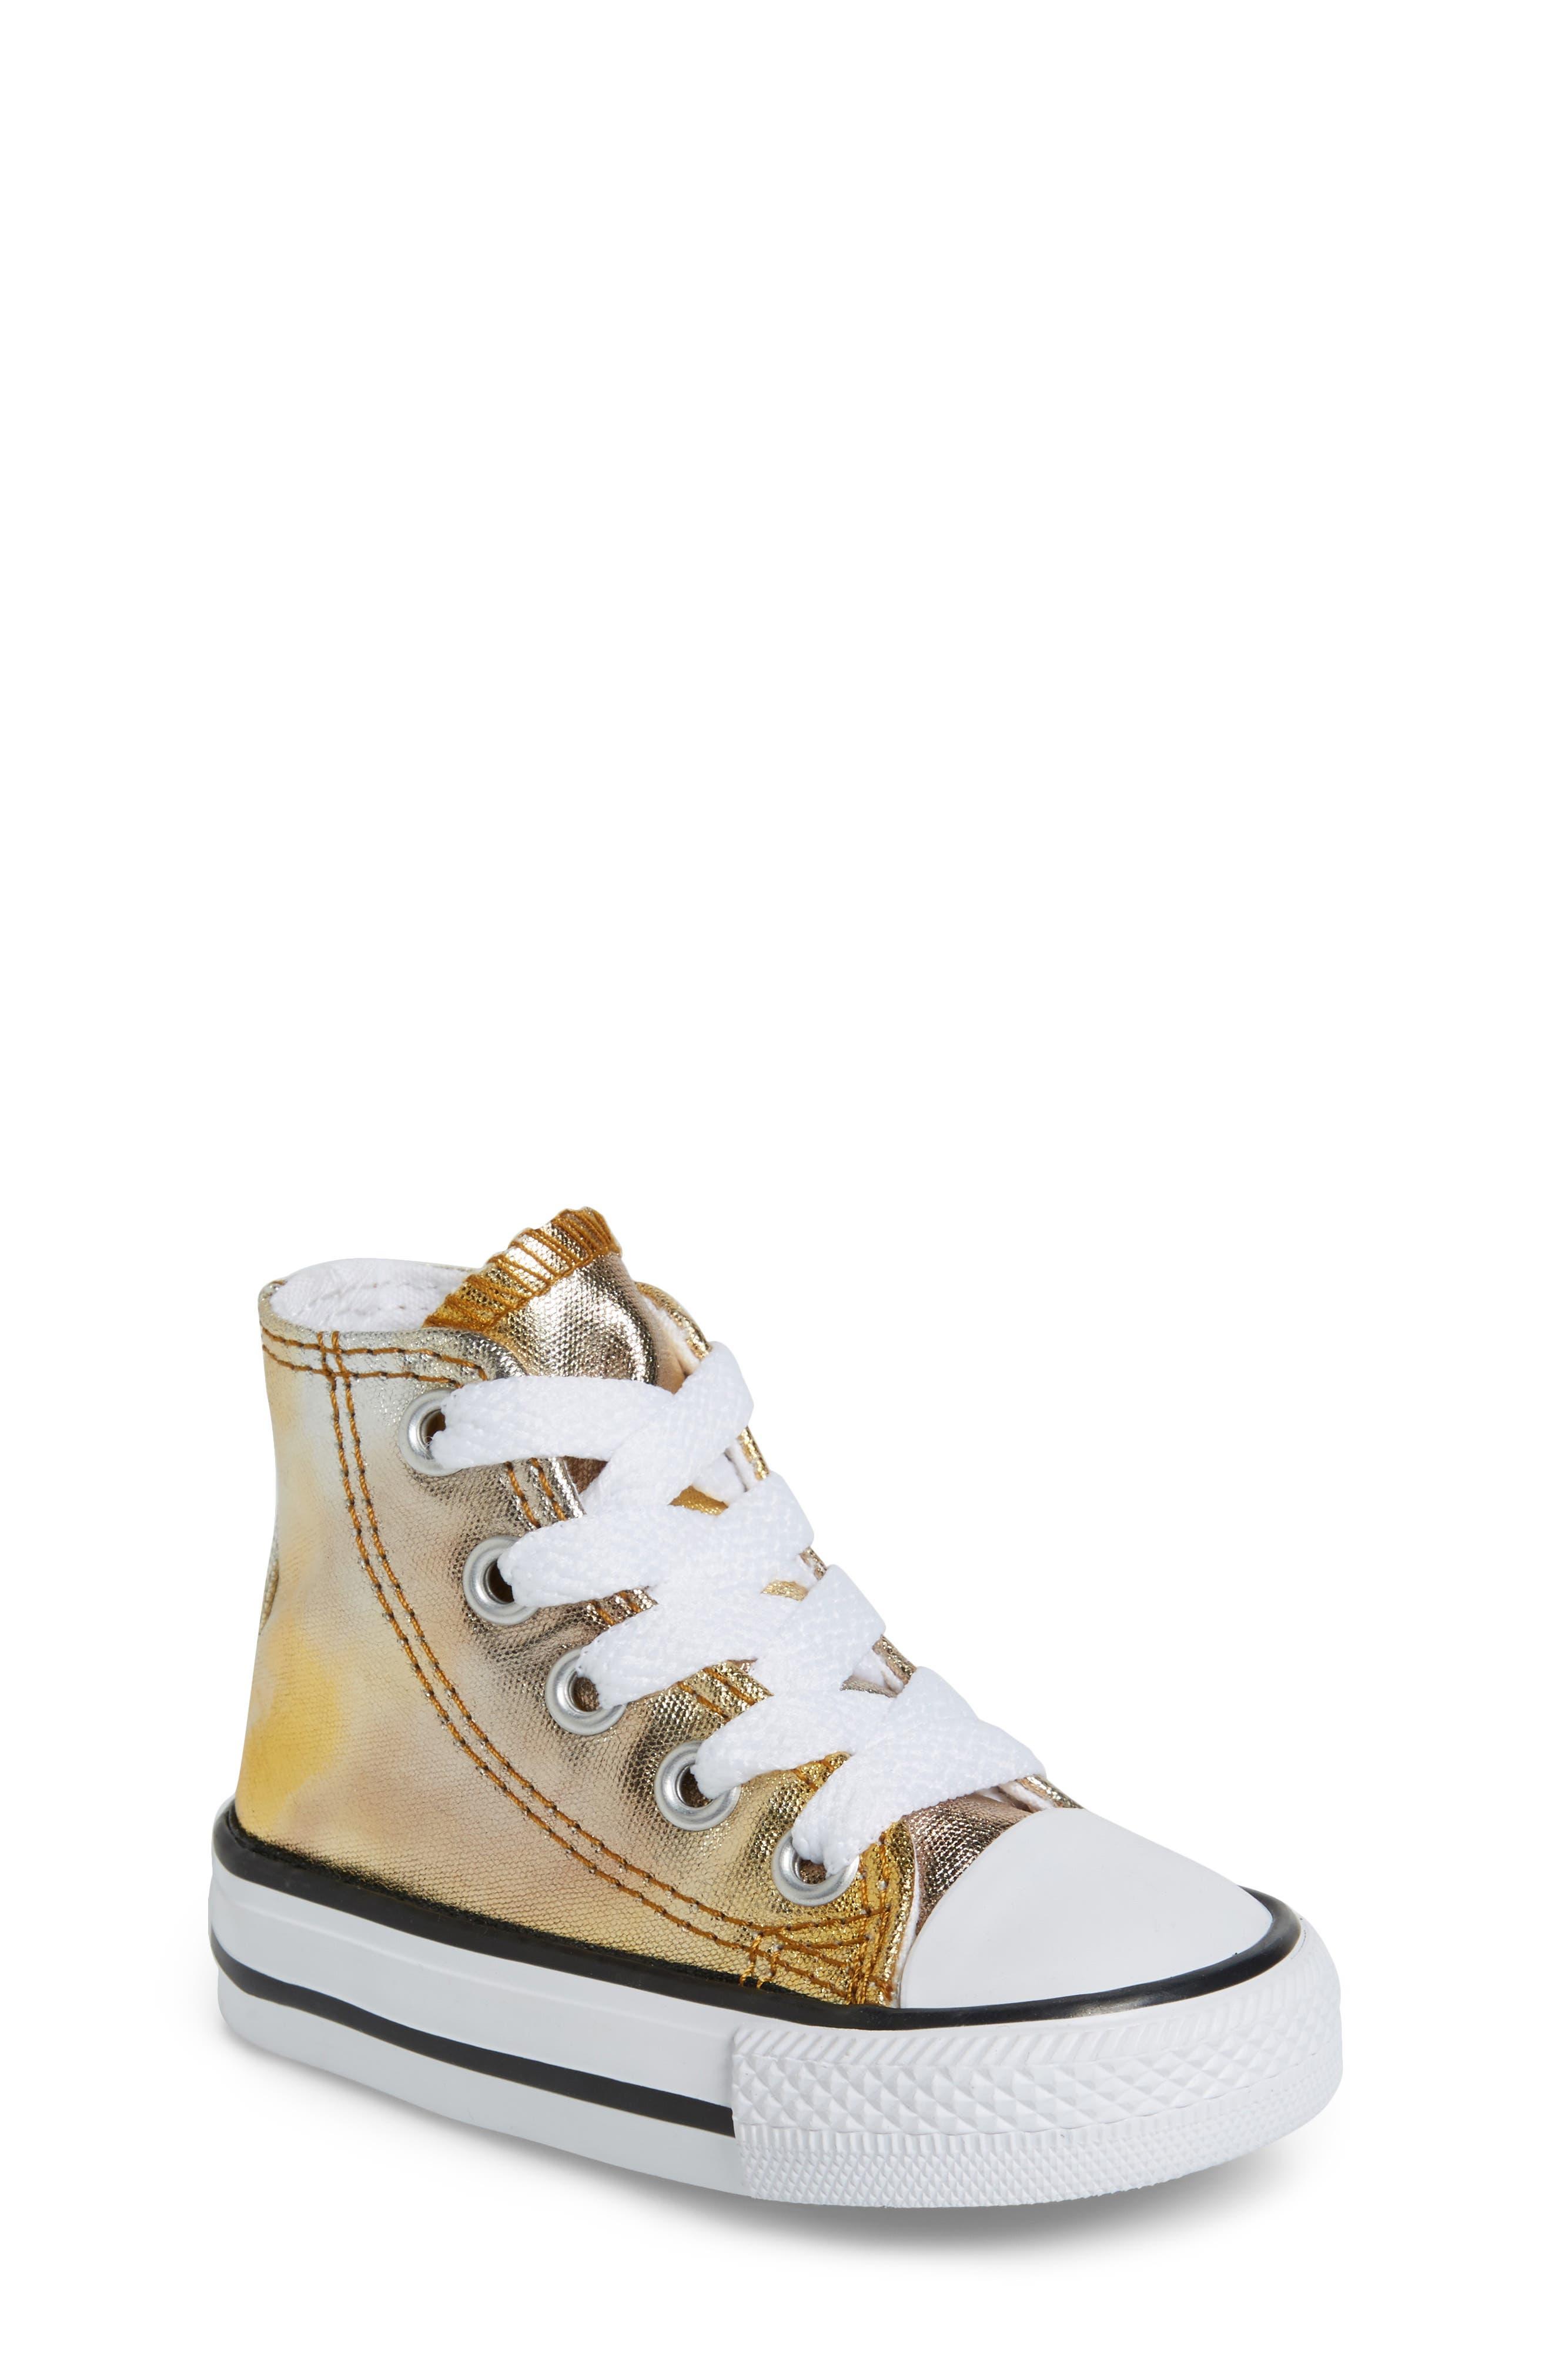 Chuck Taylor<sup>®</sup> All Star<sup>®</sup> Metallic High Top Sneaker,                             Main thumbnail 2, color,